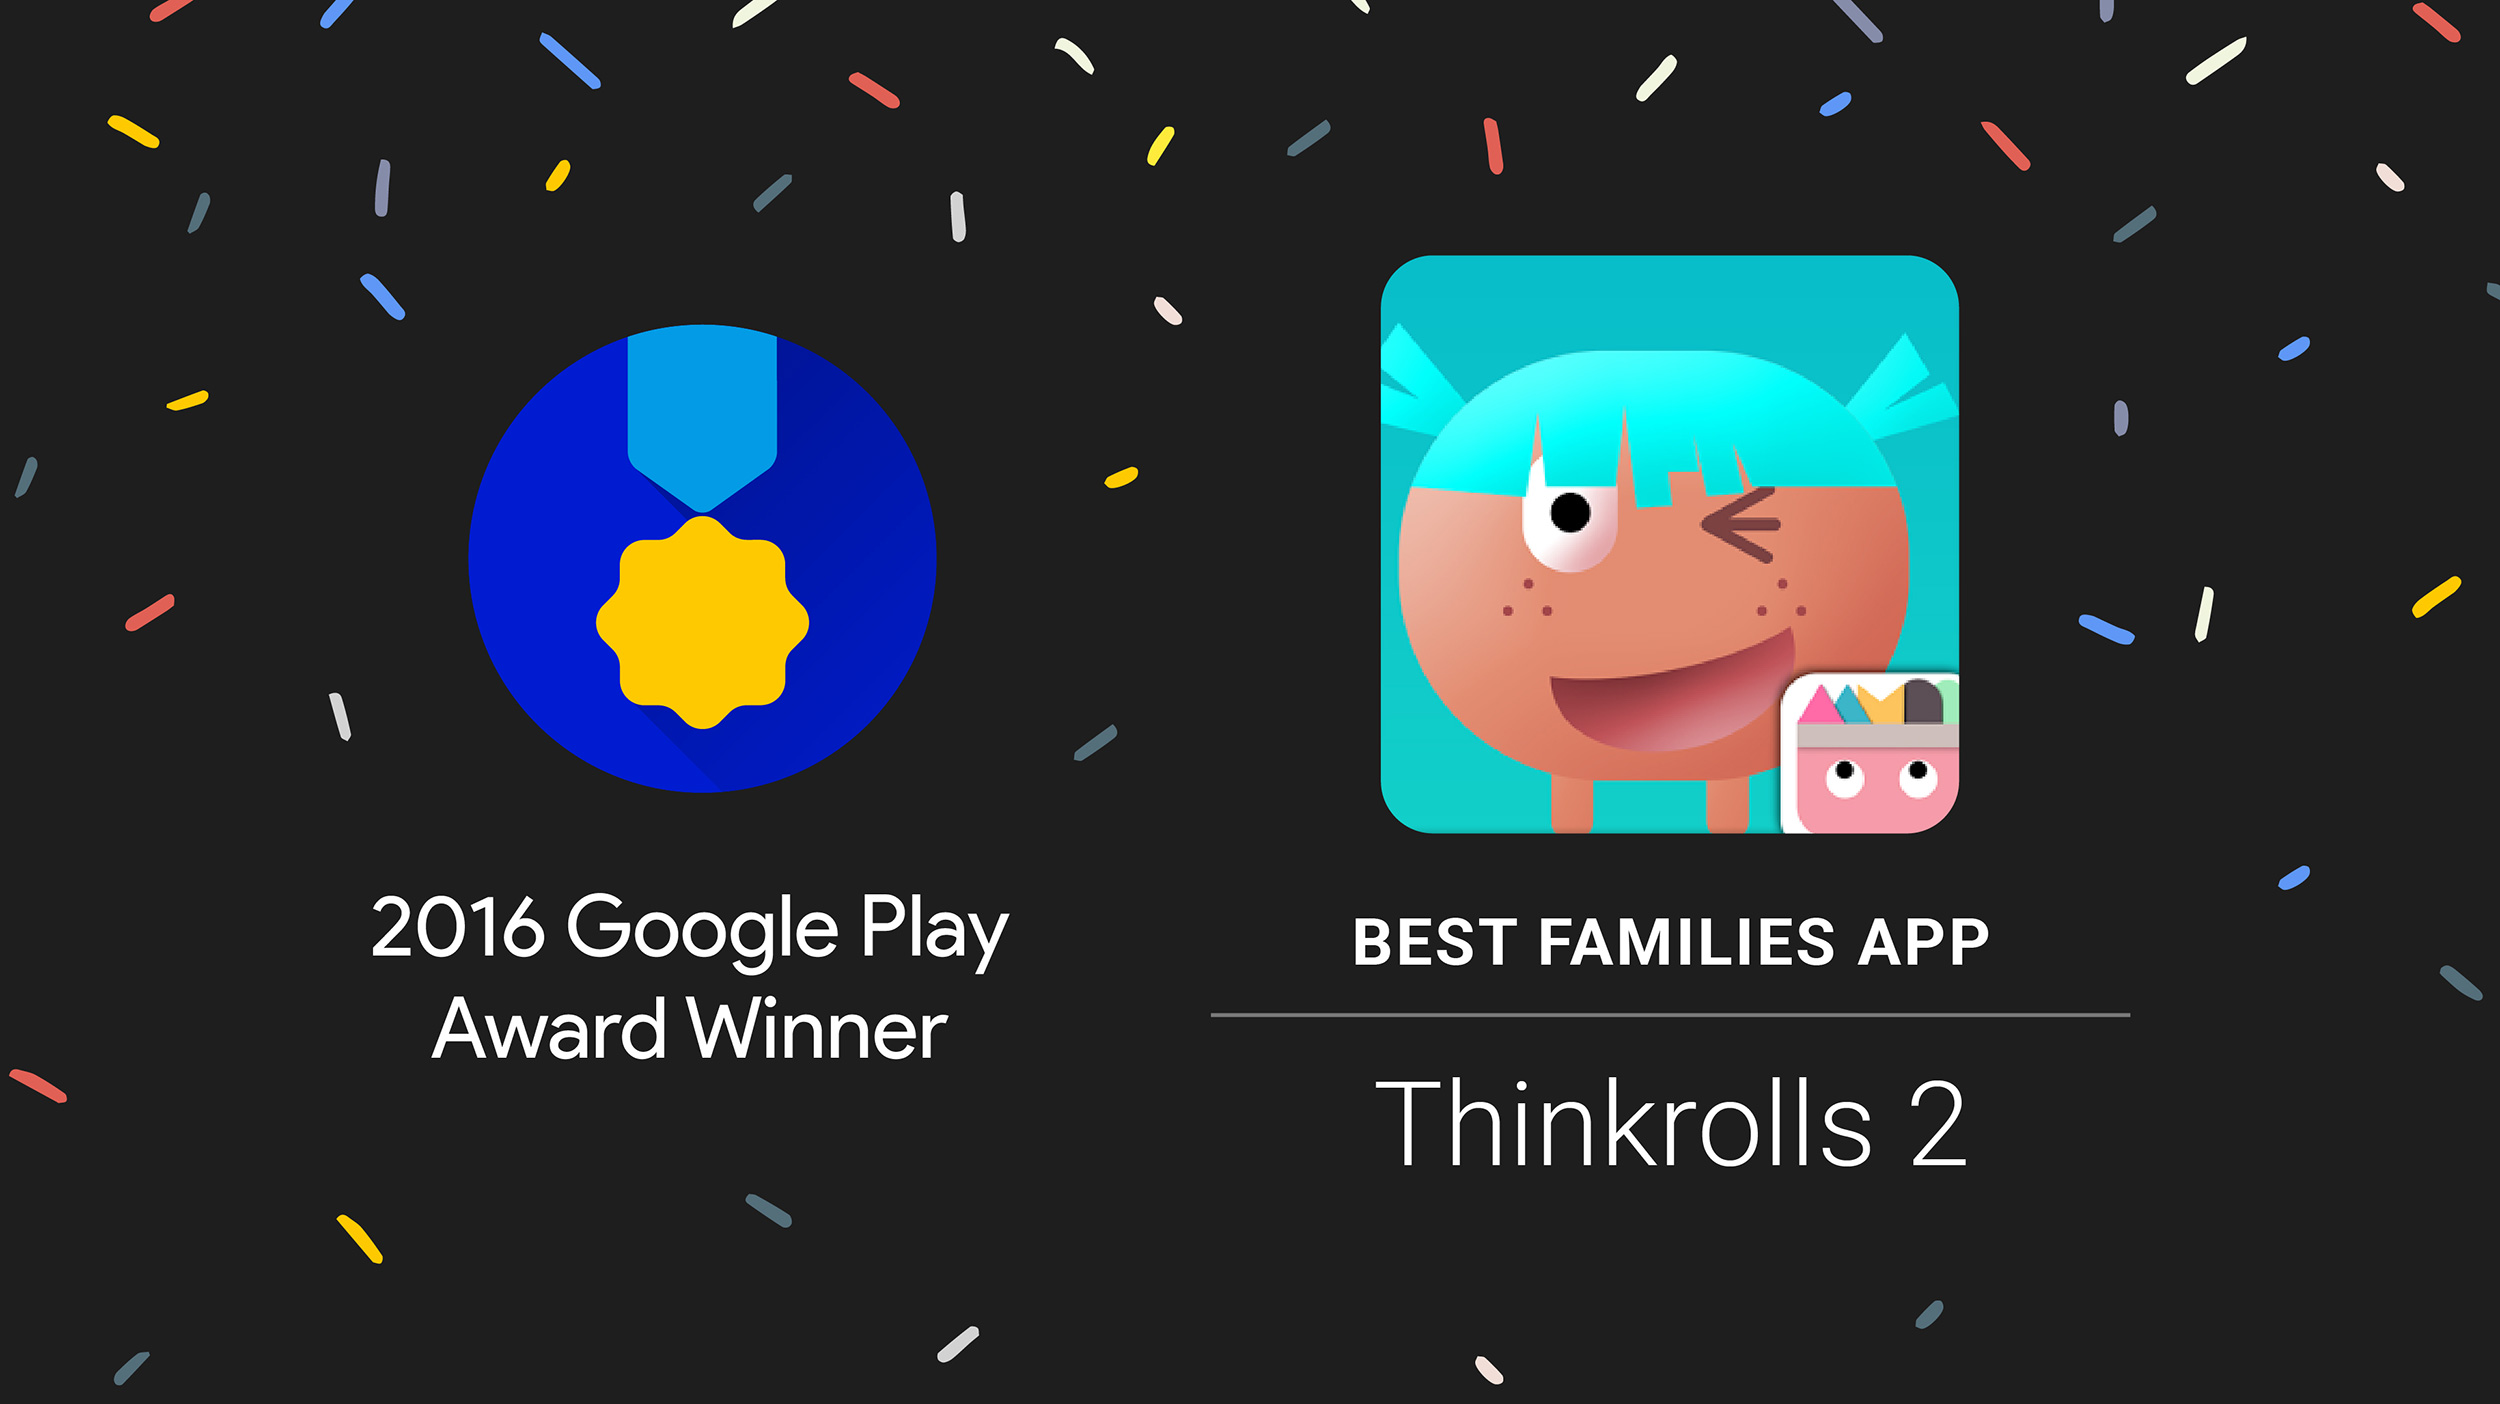 google play awards 2016 winners